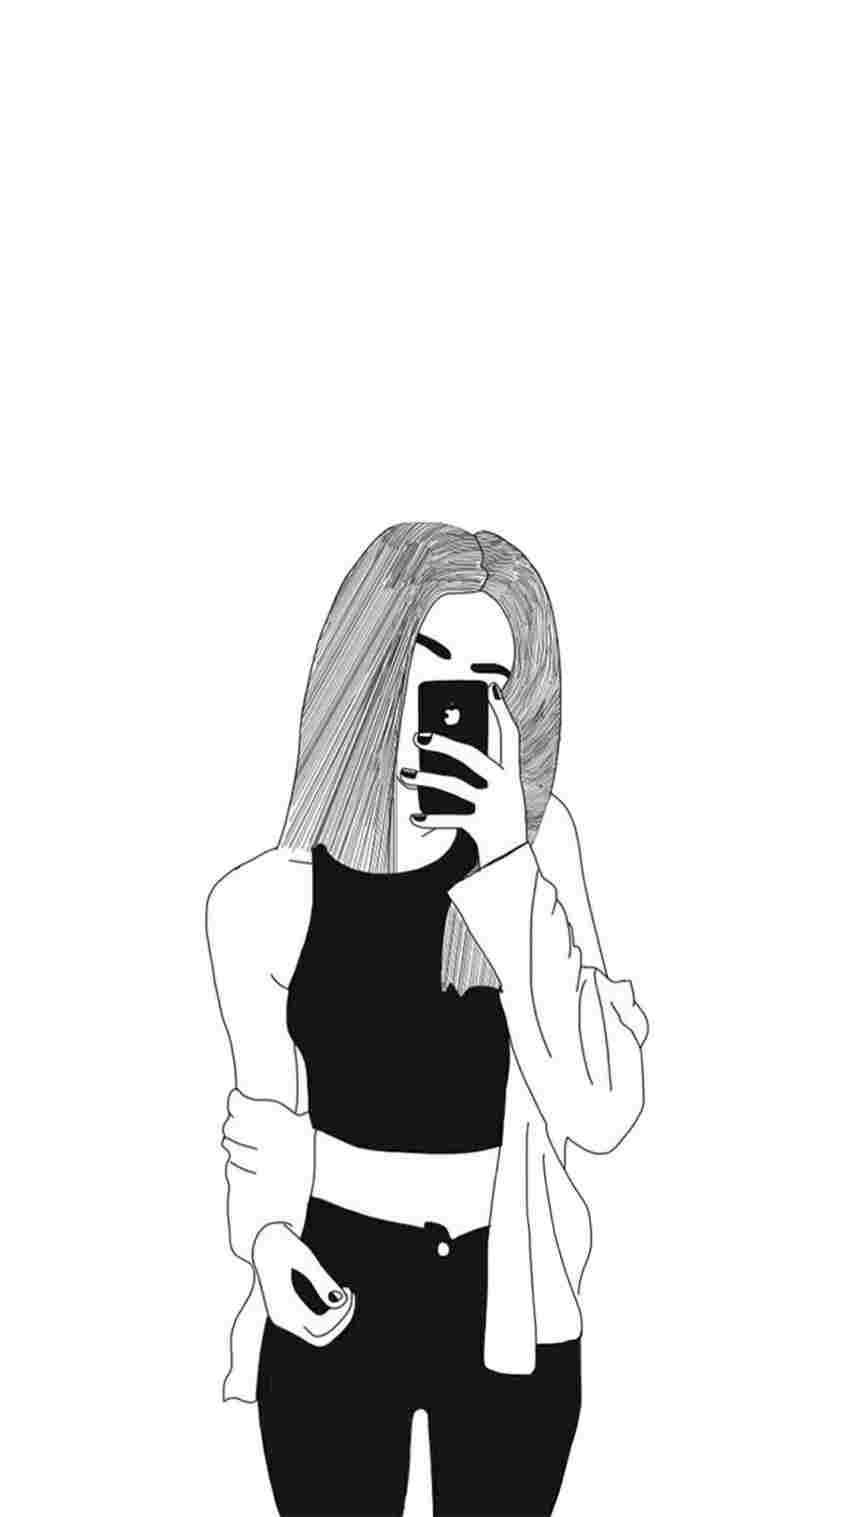 Girl Drawing Tumblr Wallpapers , Top Free Girl Drawing